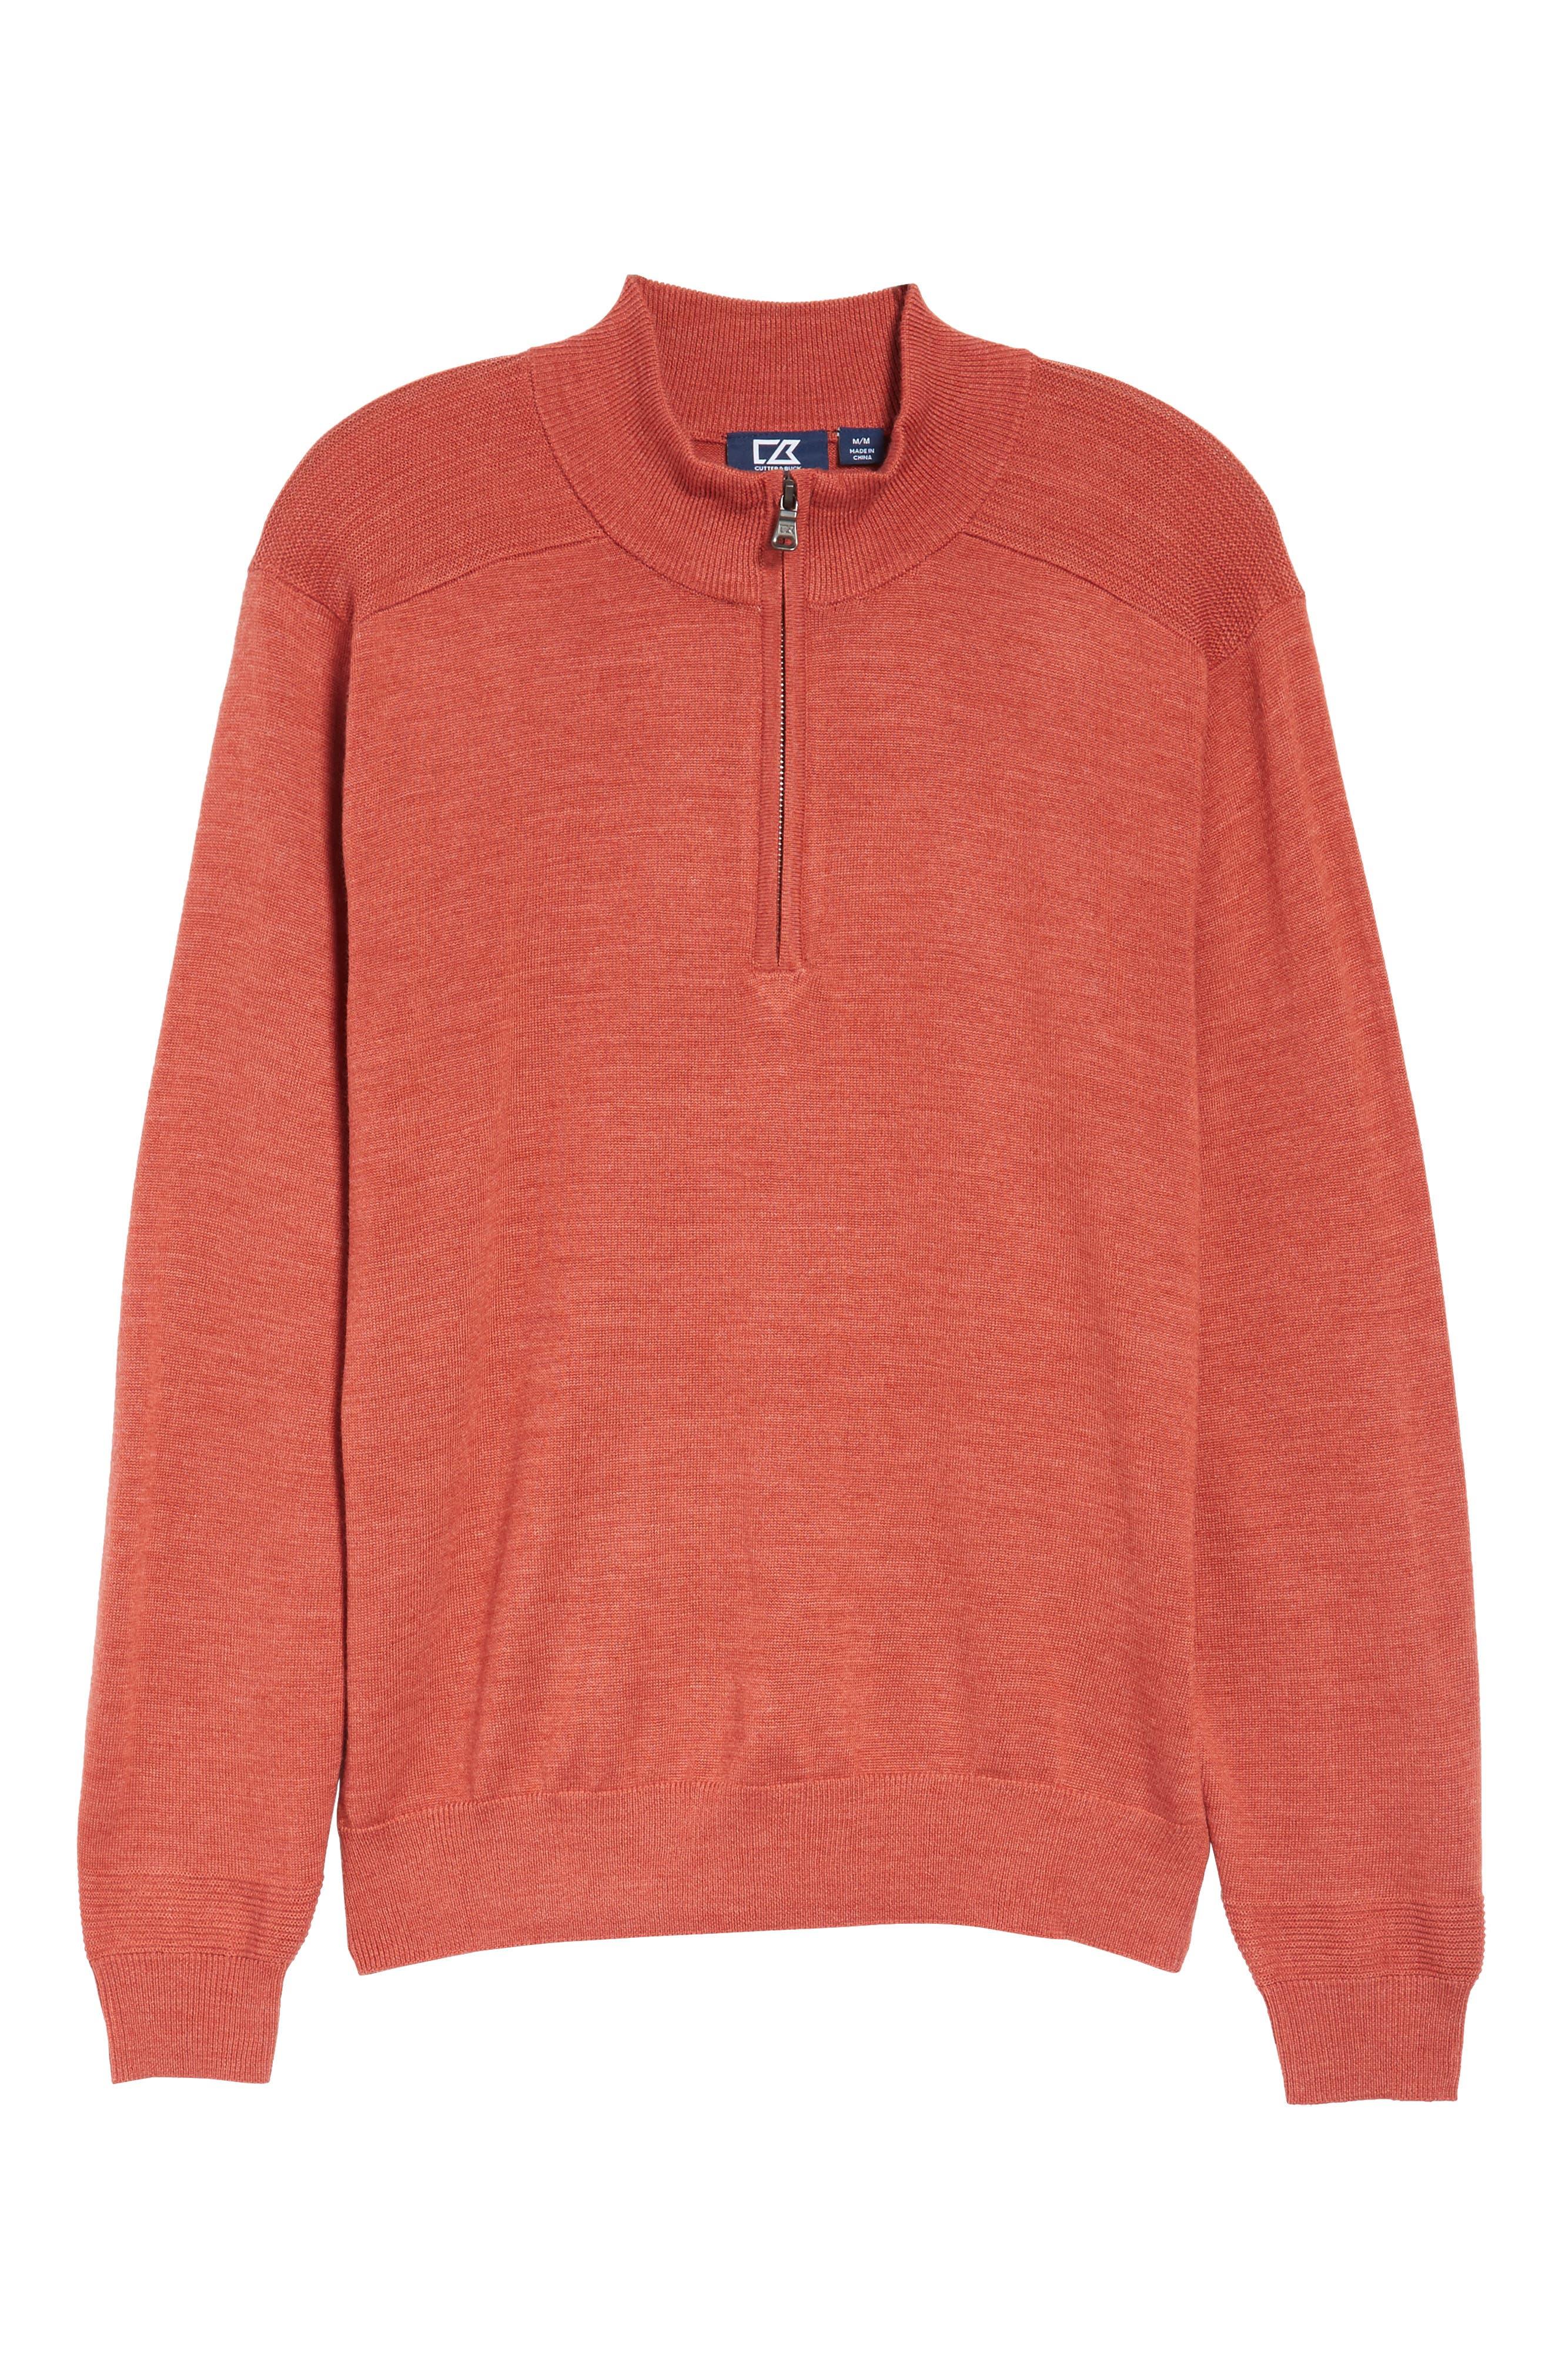 Douglas Quarter Zip Wool Blend Sweater,                             Alternate thumbnail 6, color,                             600